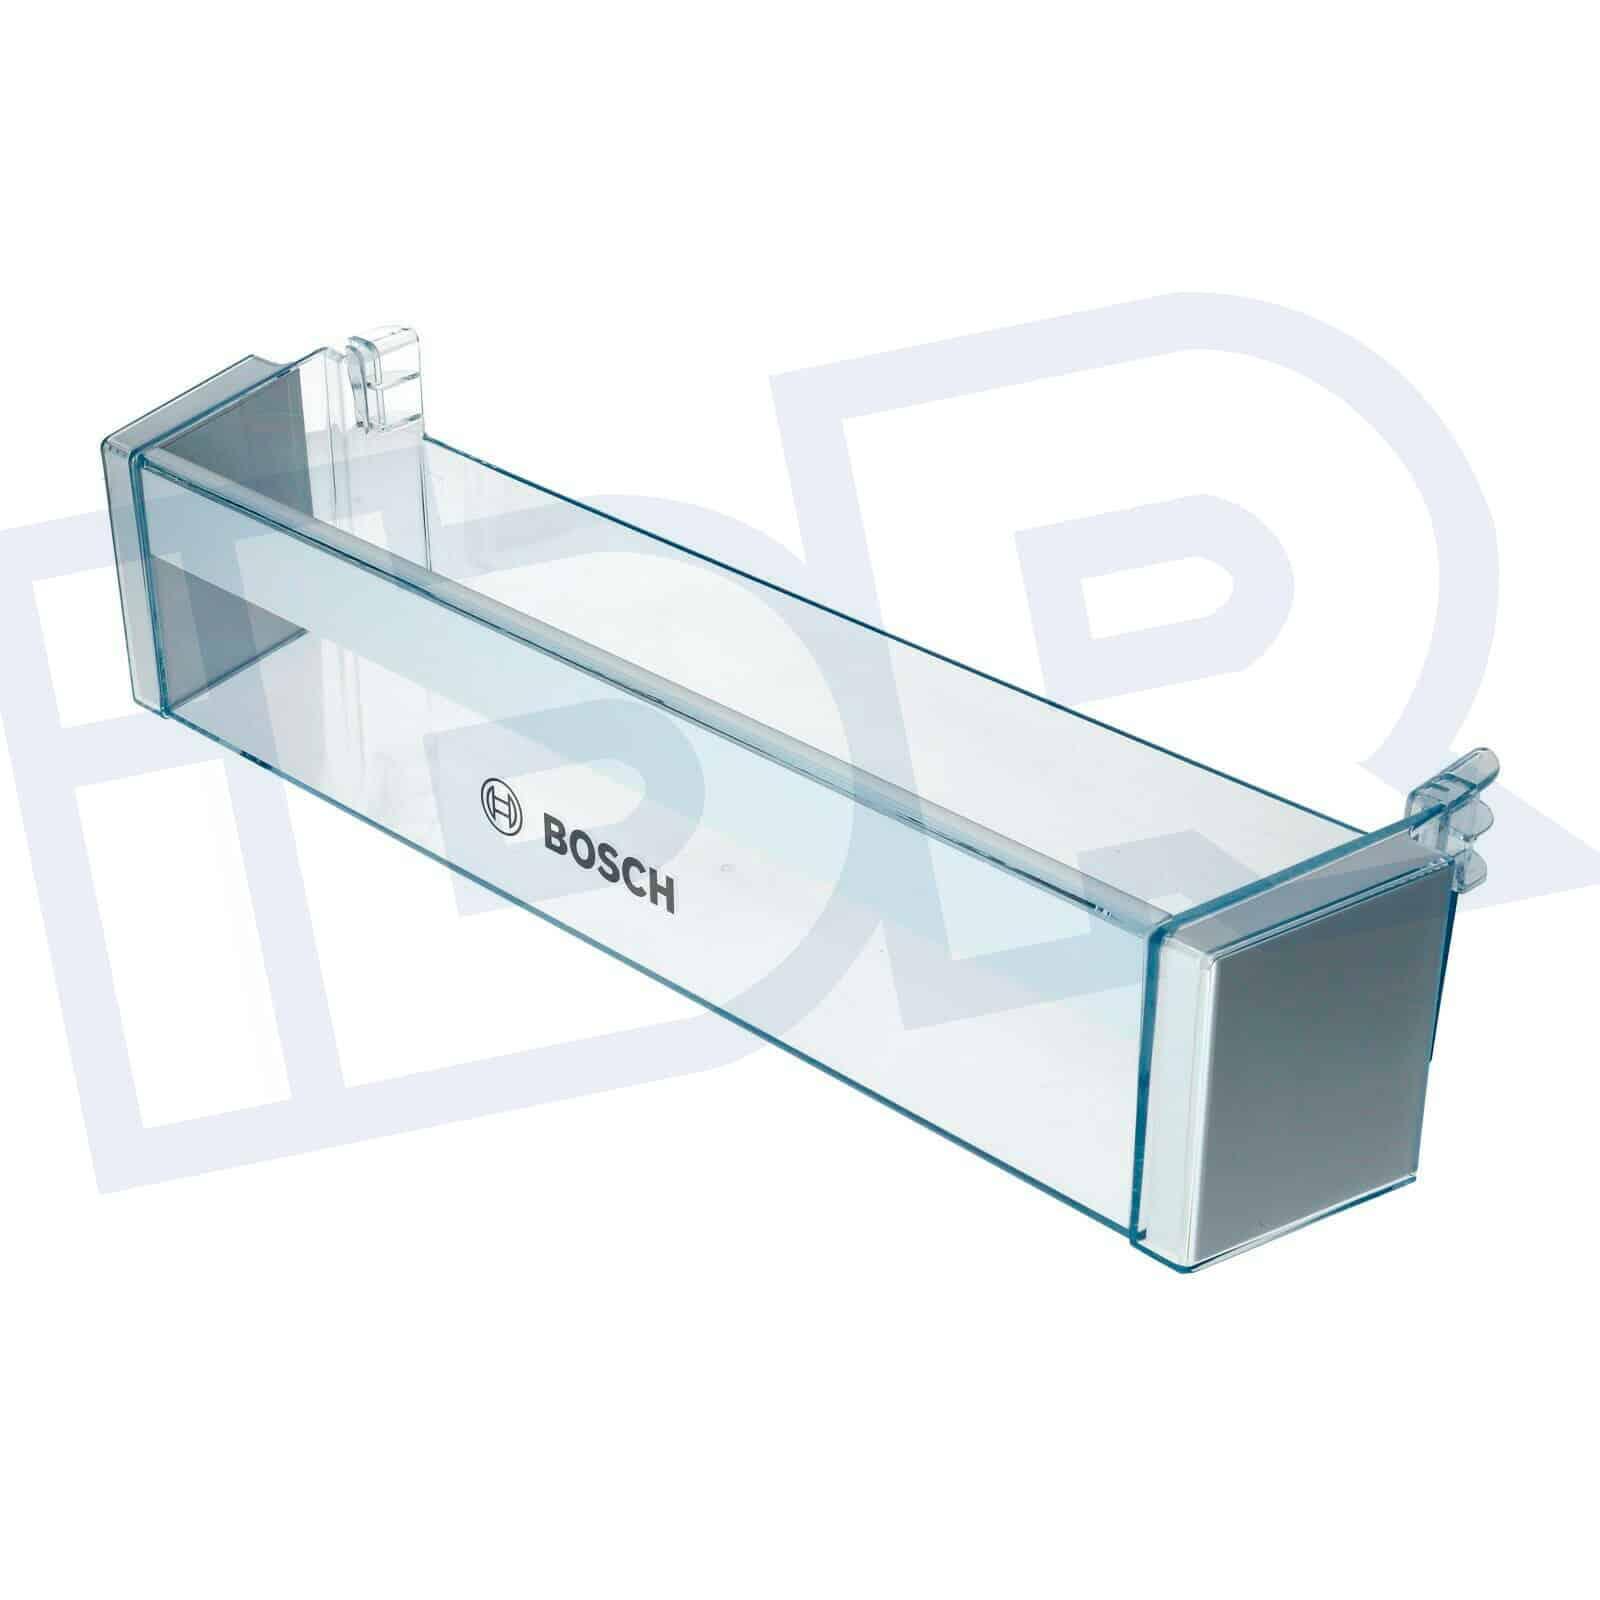 Bandeja Bosch 00704406